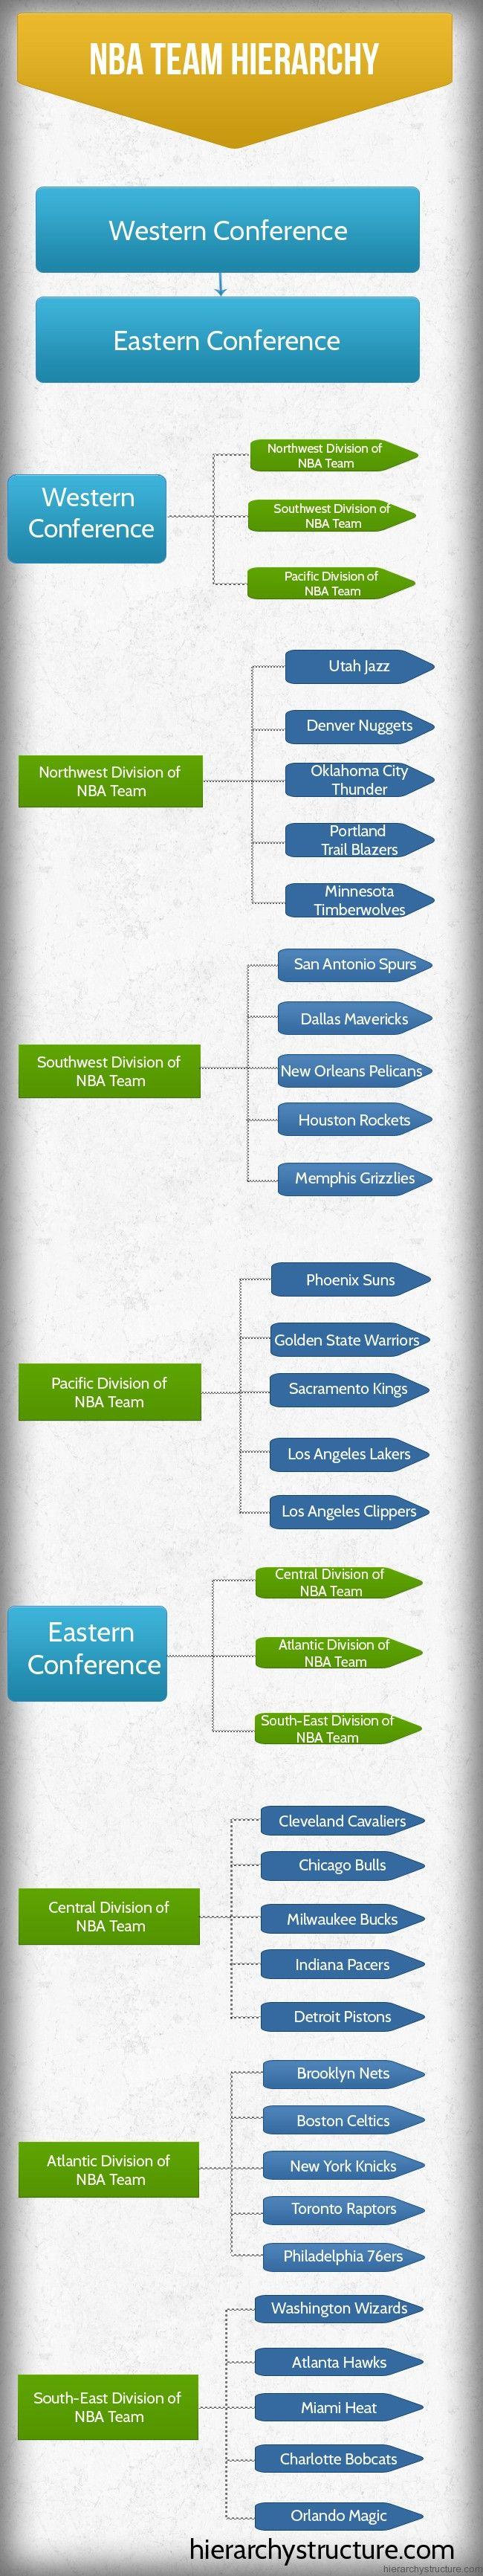 NBA Team Hierarchy | Sports Hierarchy | Pinterest | NBA, Nba ...